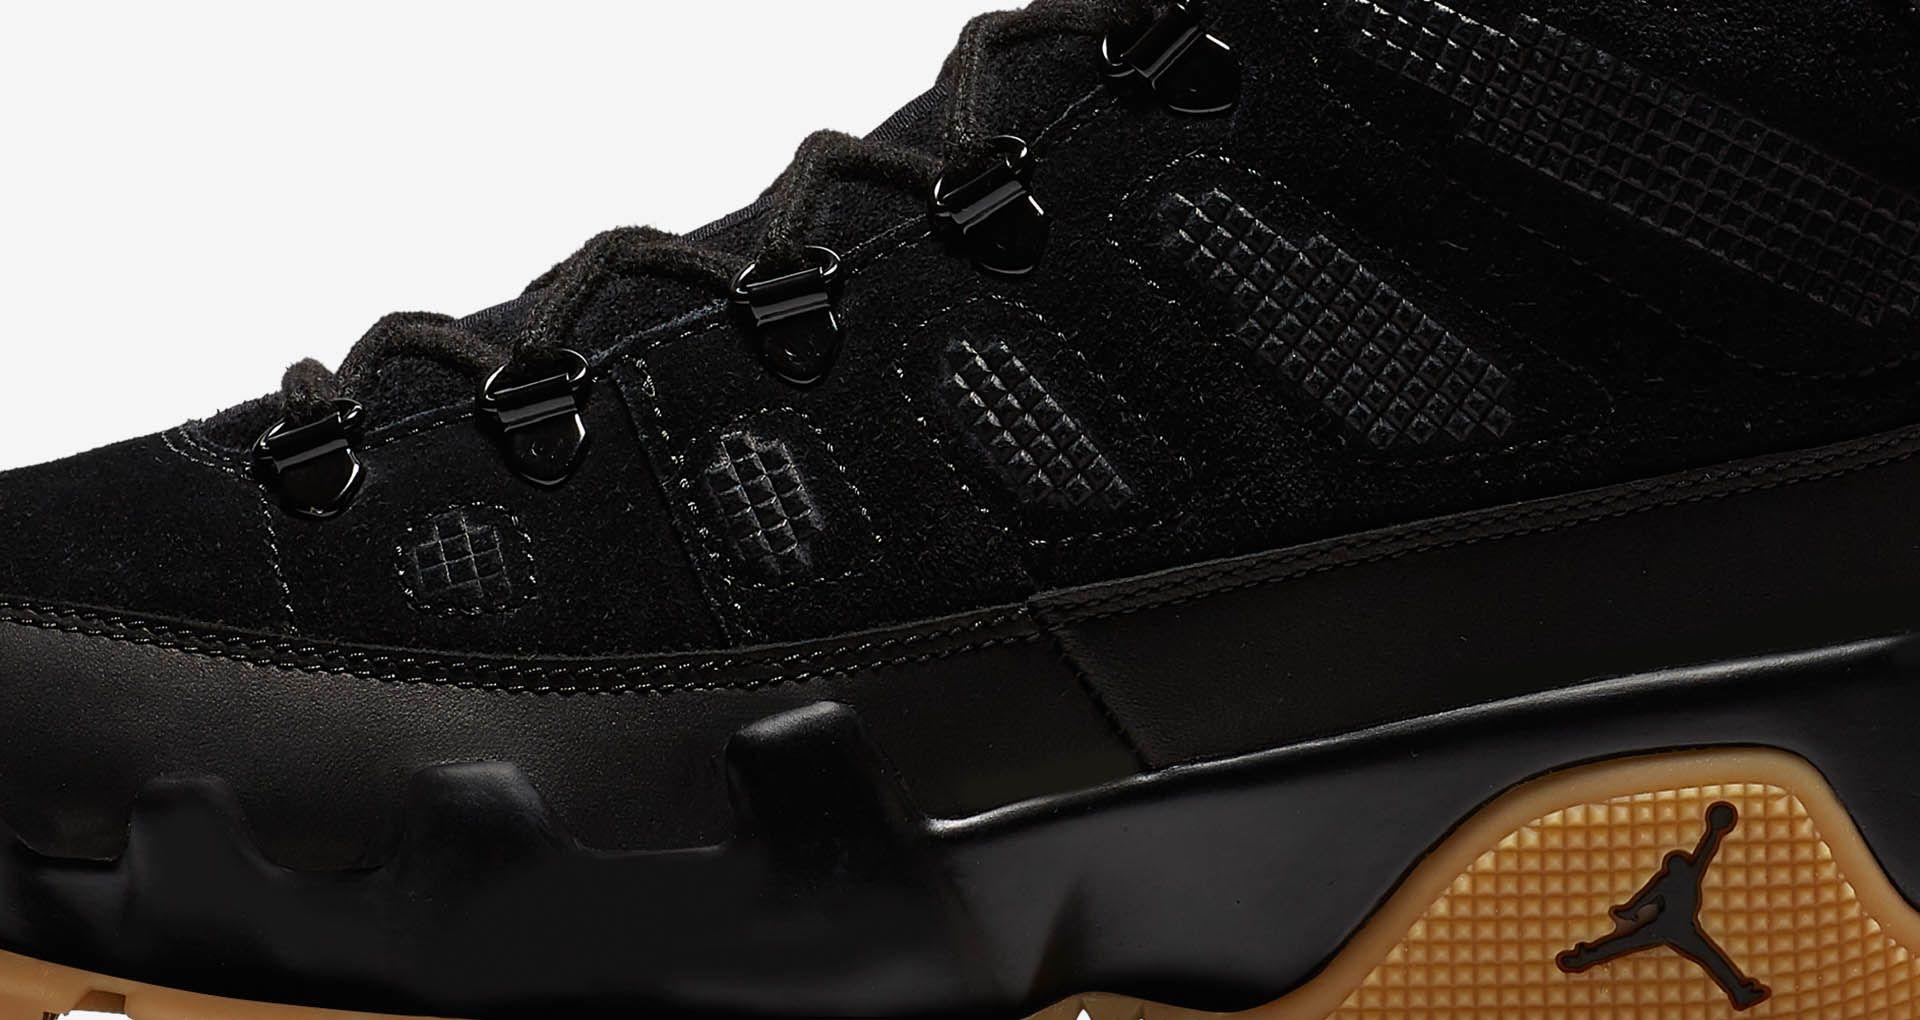 outlet store c095e 8cebb Air Jordan 9 Retro Boot NRG 'Black & Gum Light Brown ...